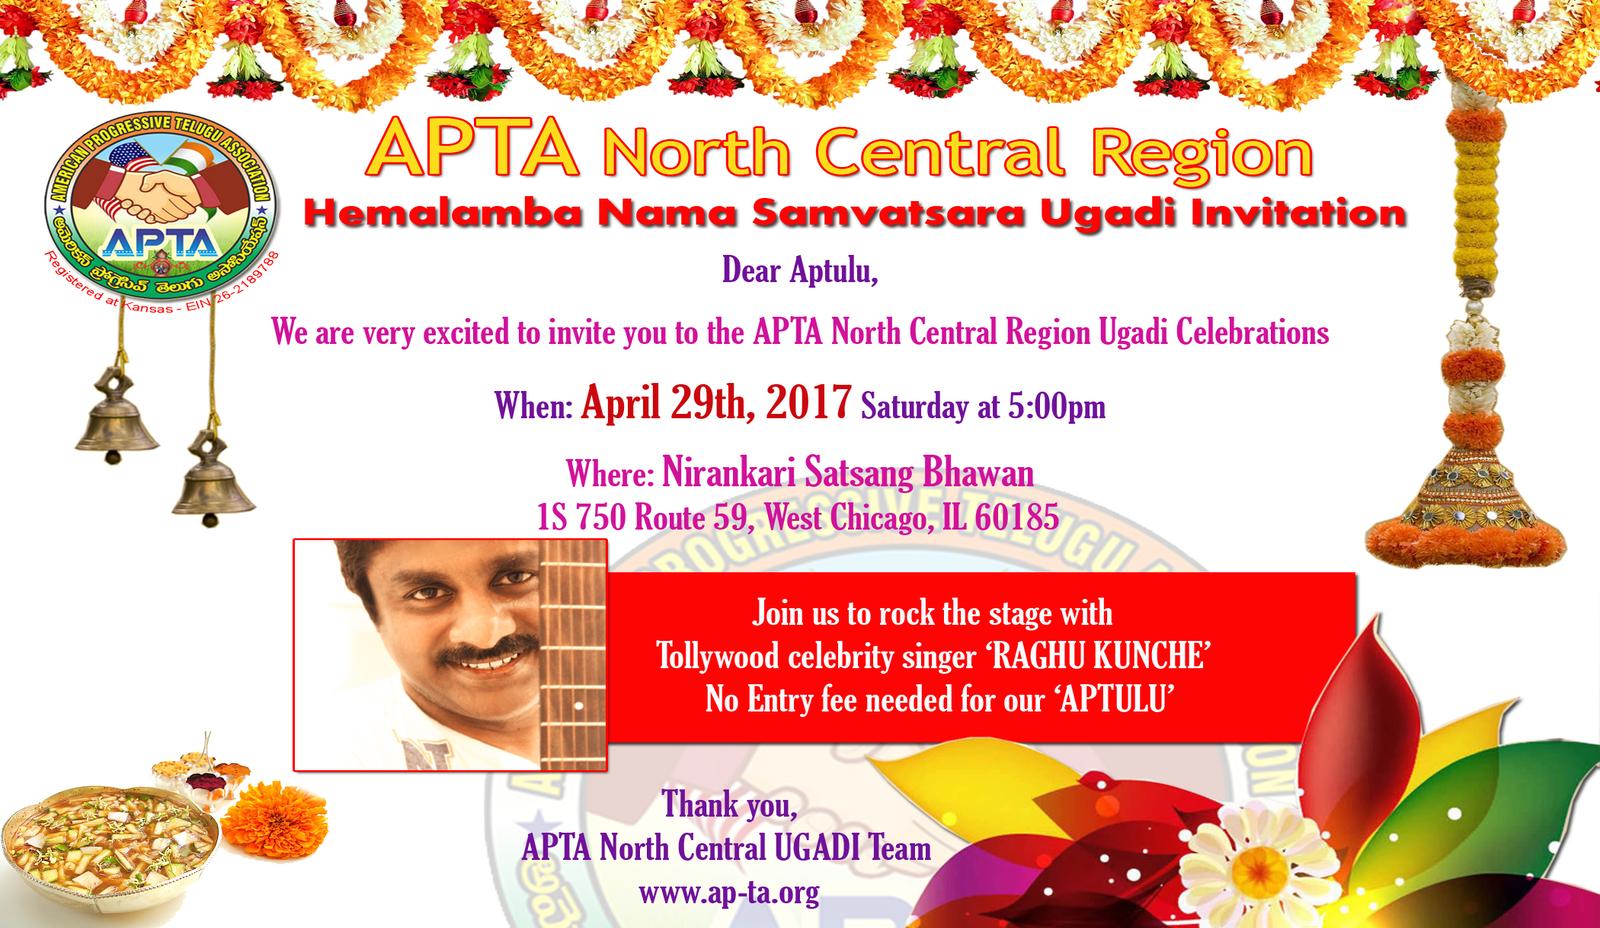 APTA North central region Ugadi Invitation 2017